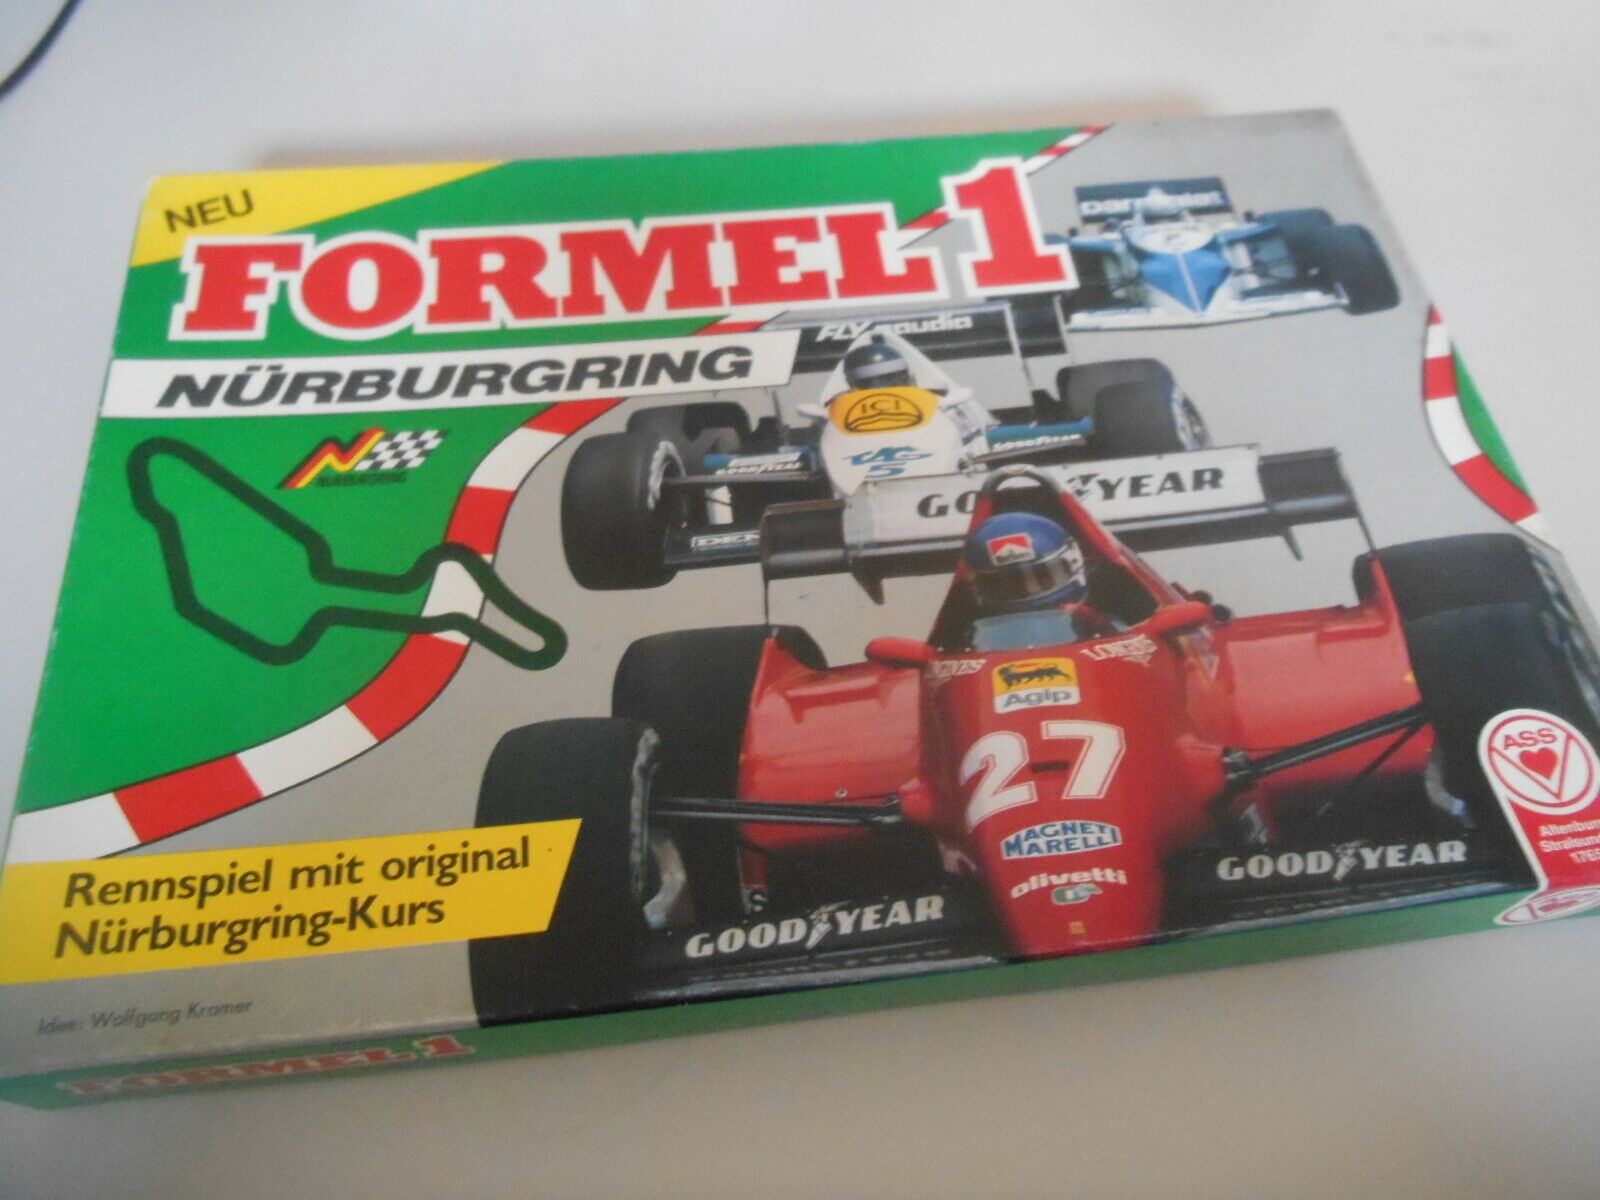 Gioco Wolfgang Kramer-formula 1  Nurburgring (a partire da 8j 2-6 sp.) ASA  marca